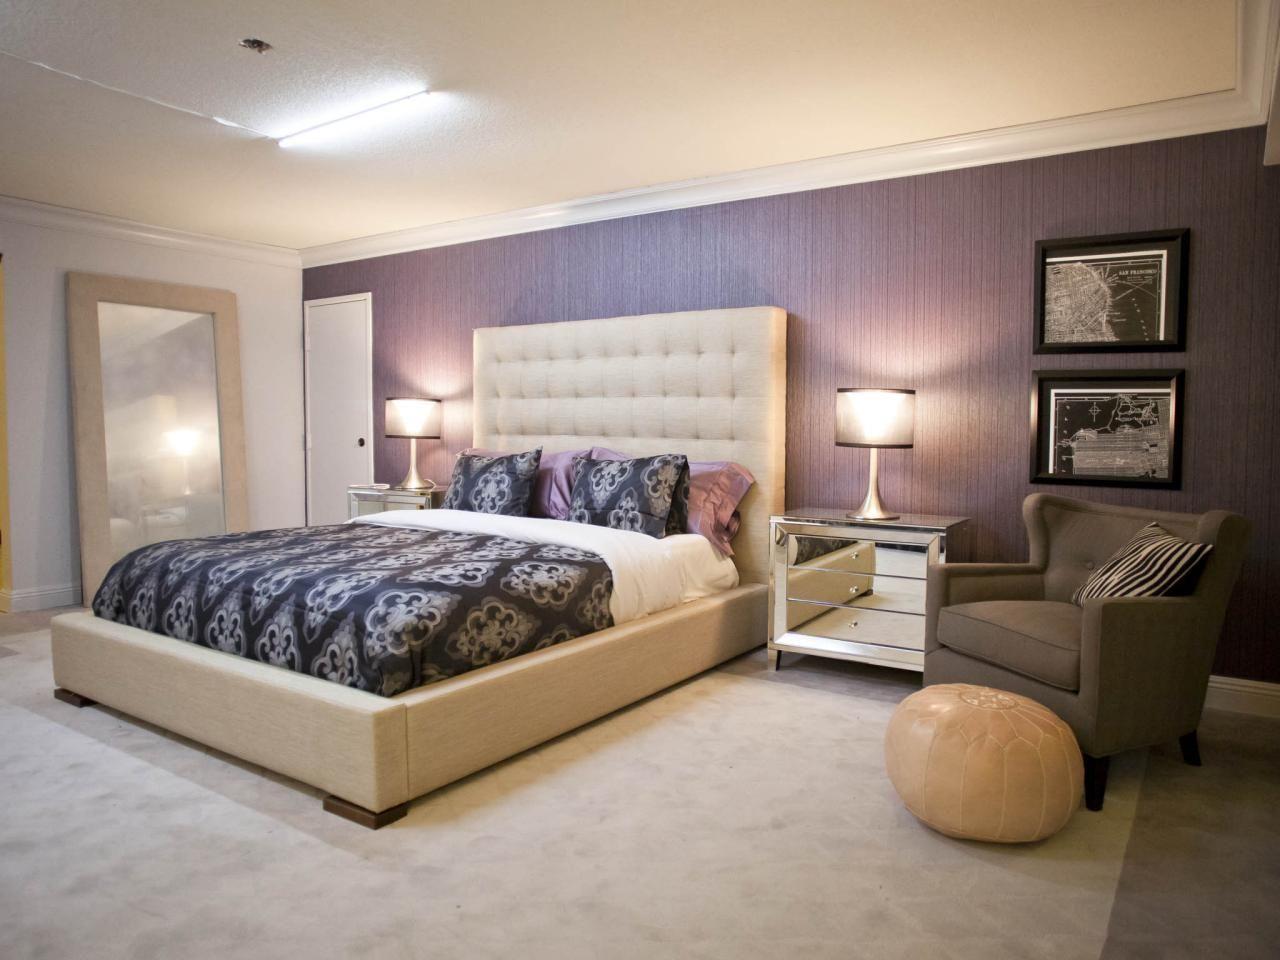 pinsally goodman on home   pinterest   bedrooms